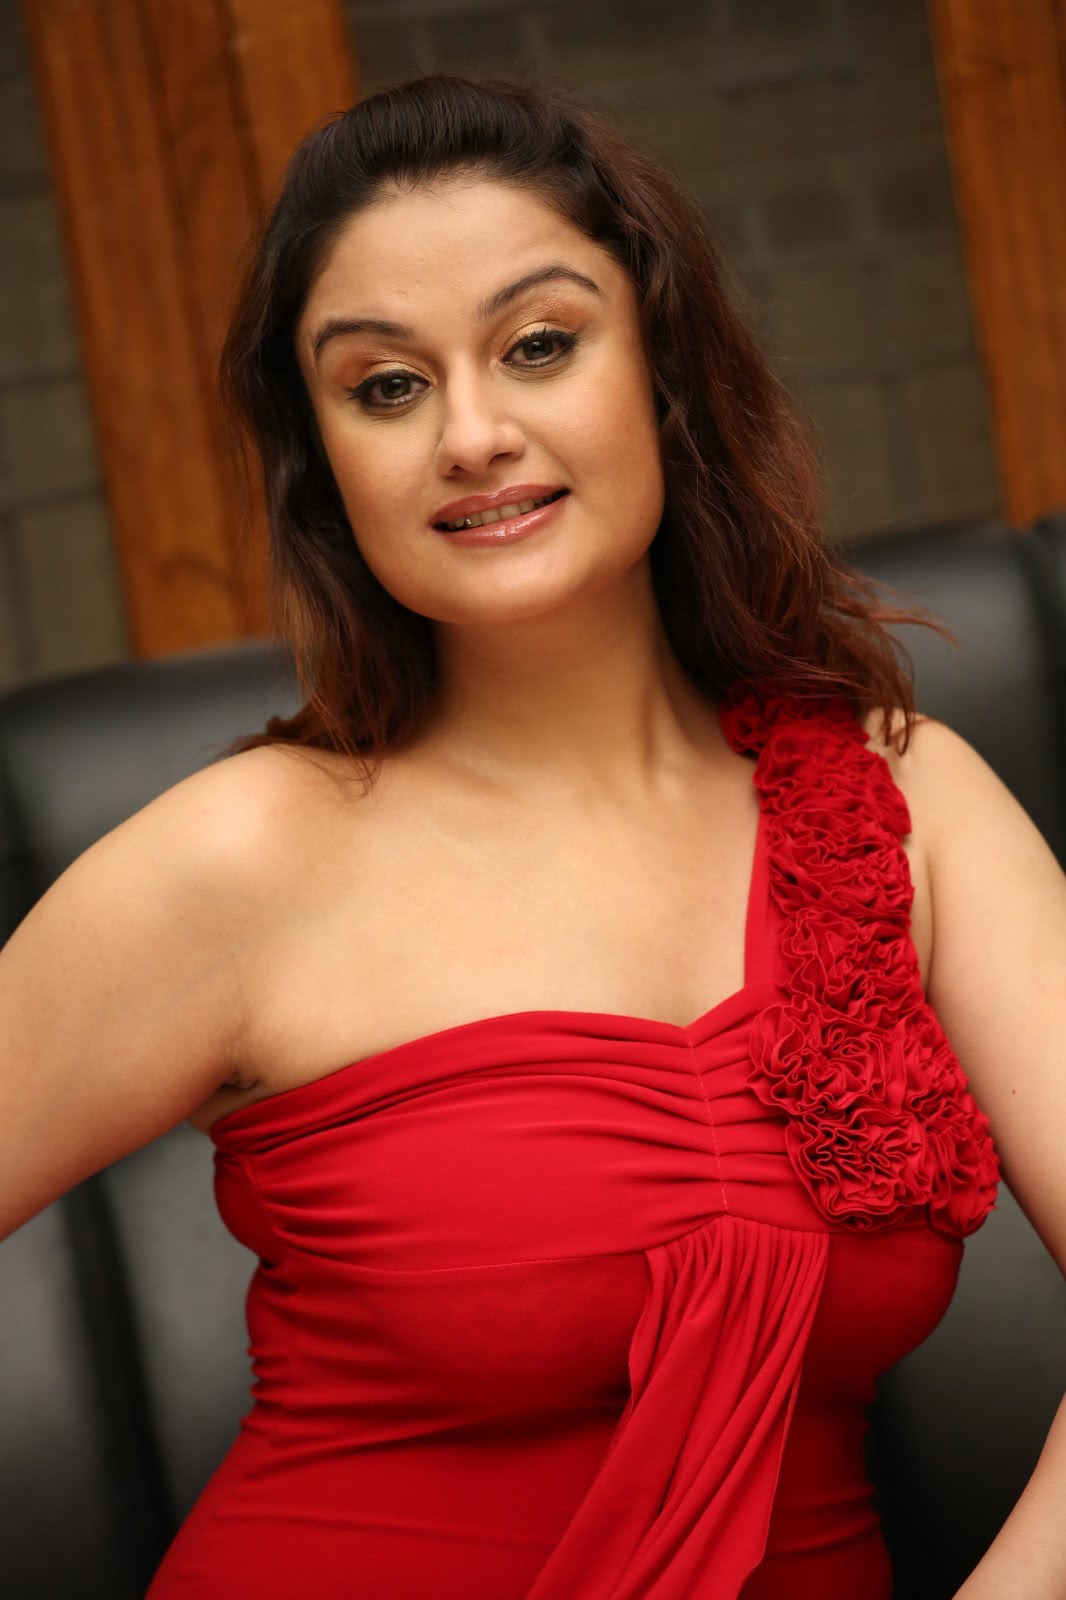 Susan Hampshire,Vithika Sheru Adult pictures Helen Rowland (actress),Jasika Nicole